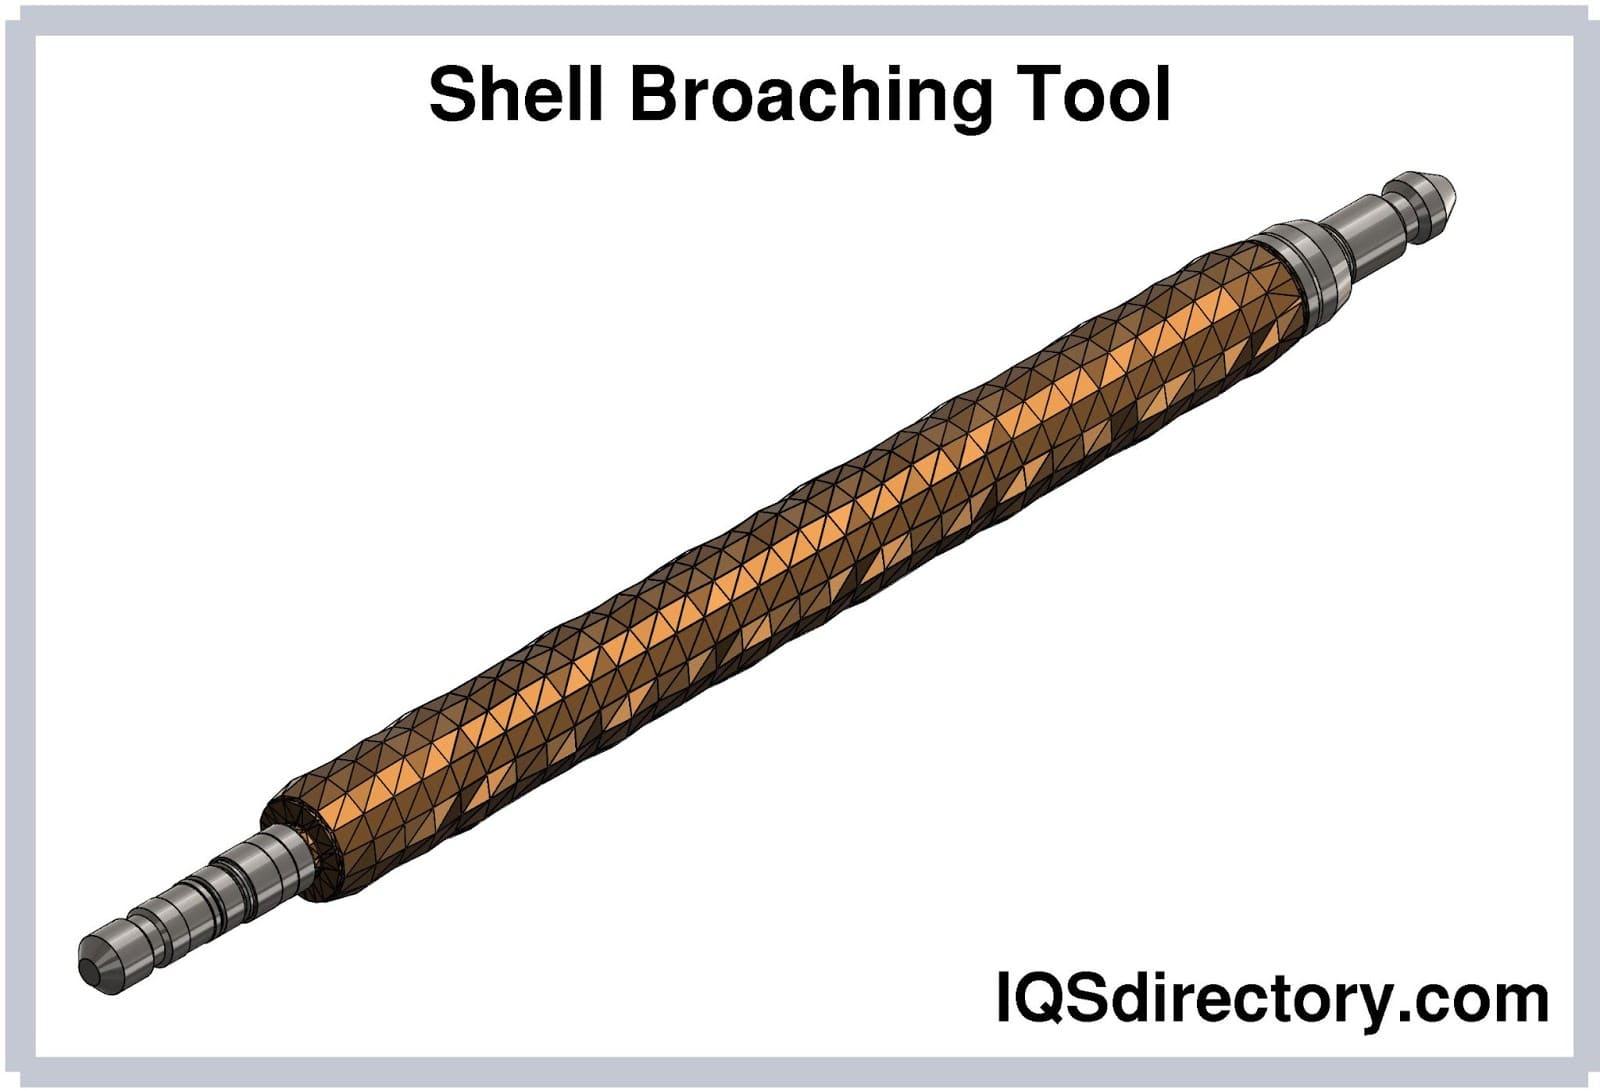 Shell Broaching Tool